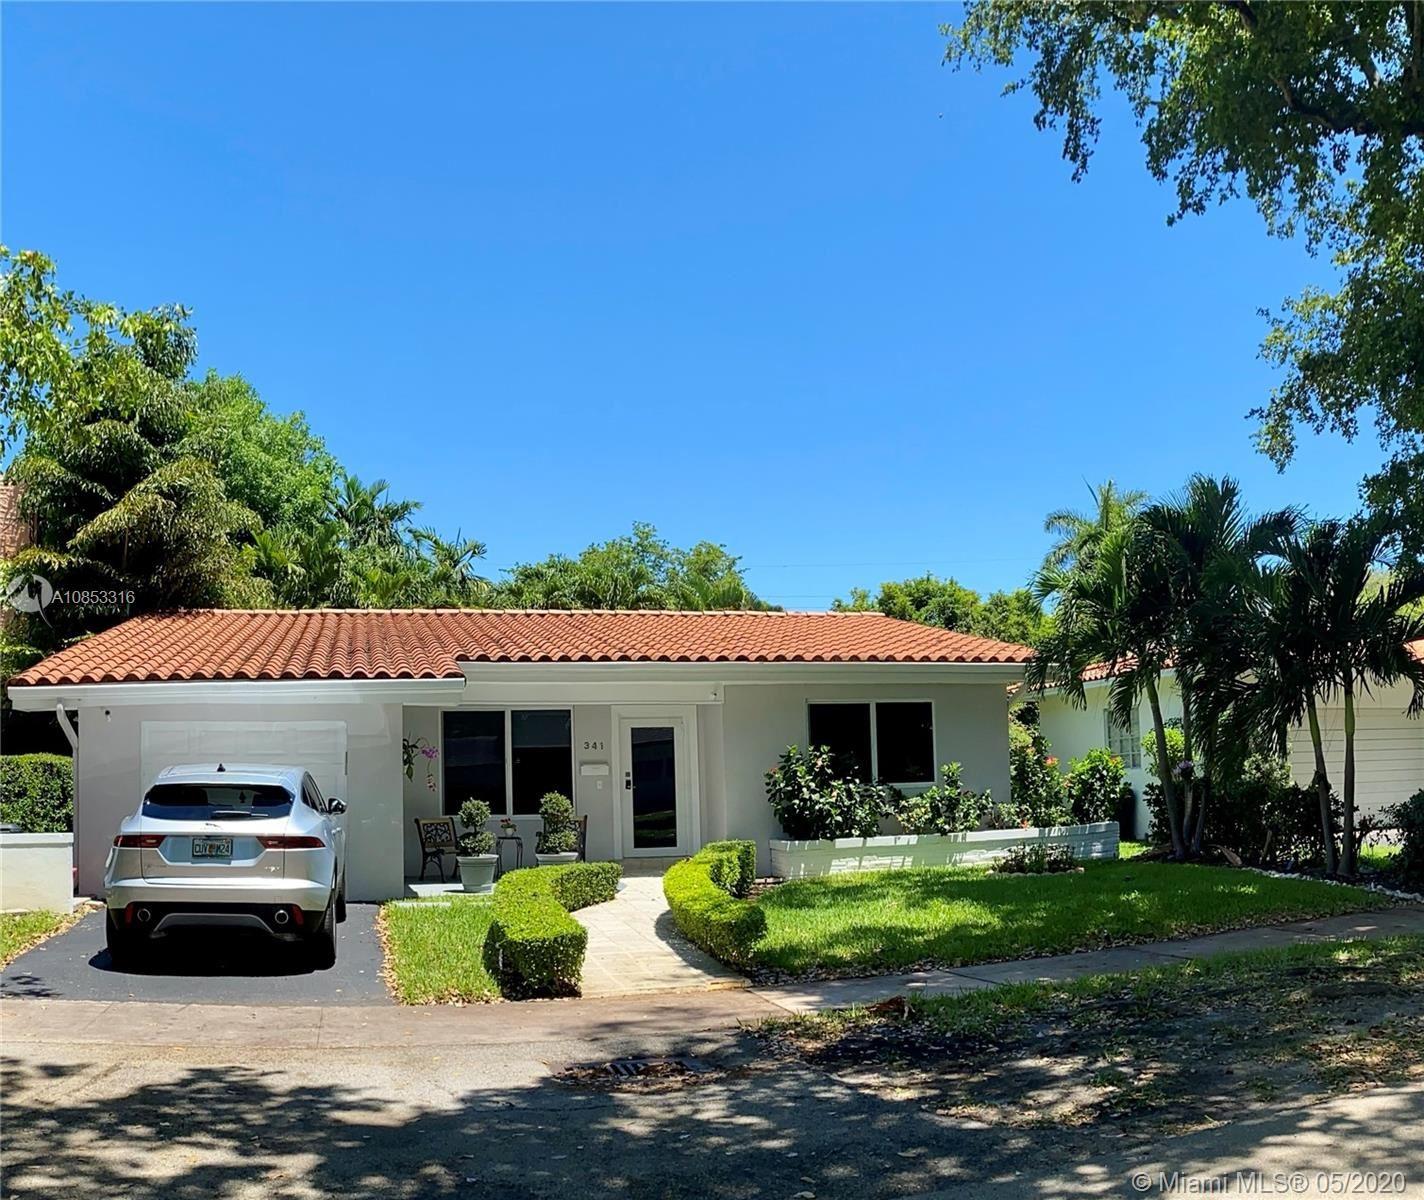 341 Aledo Ave, Coral Gables, FL 33134 - #: A10853316